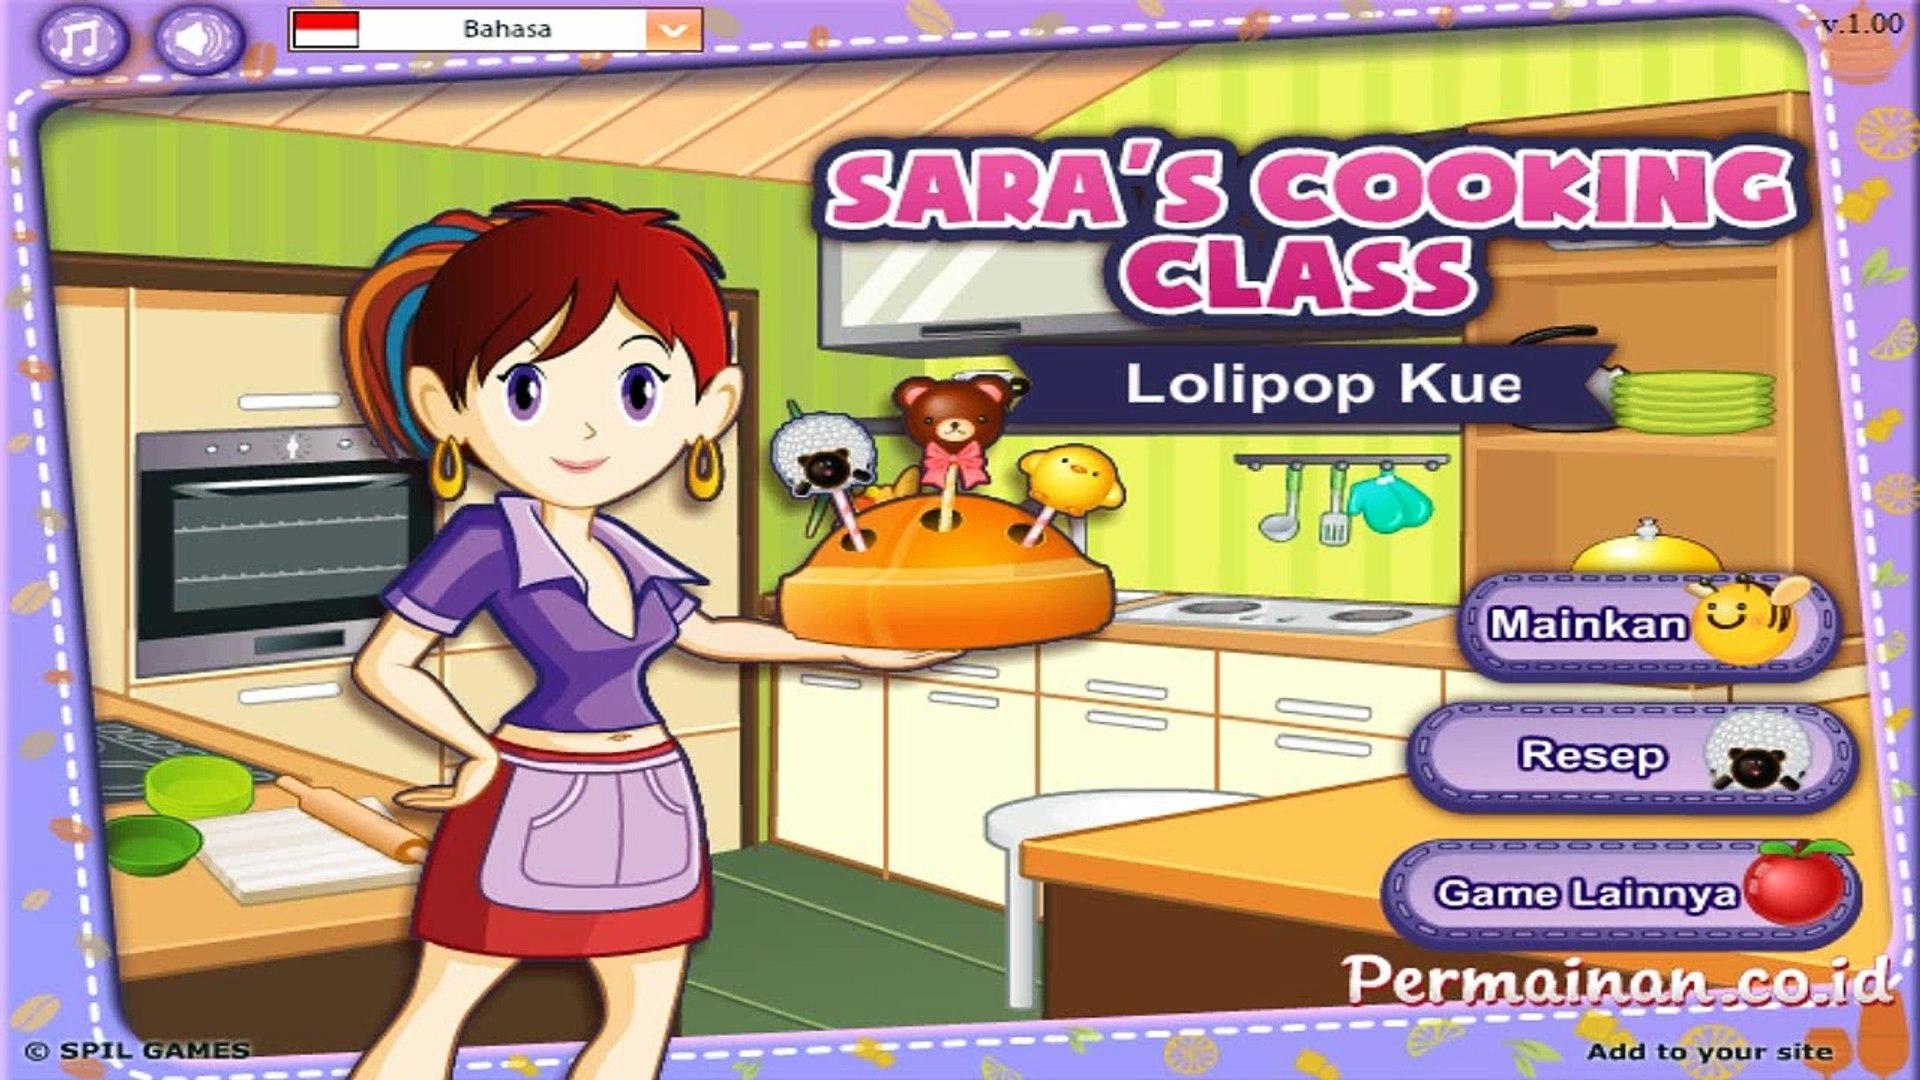 Permainan Lolipop Kue Kelas Memasak Sara Mainan Anak Perempuan Masak Masakan Online Video Dailymotion